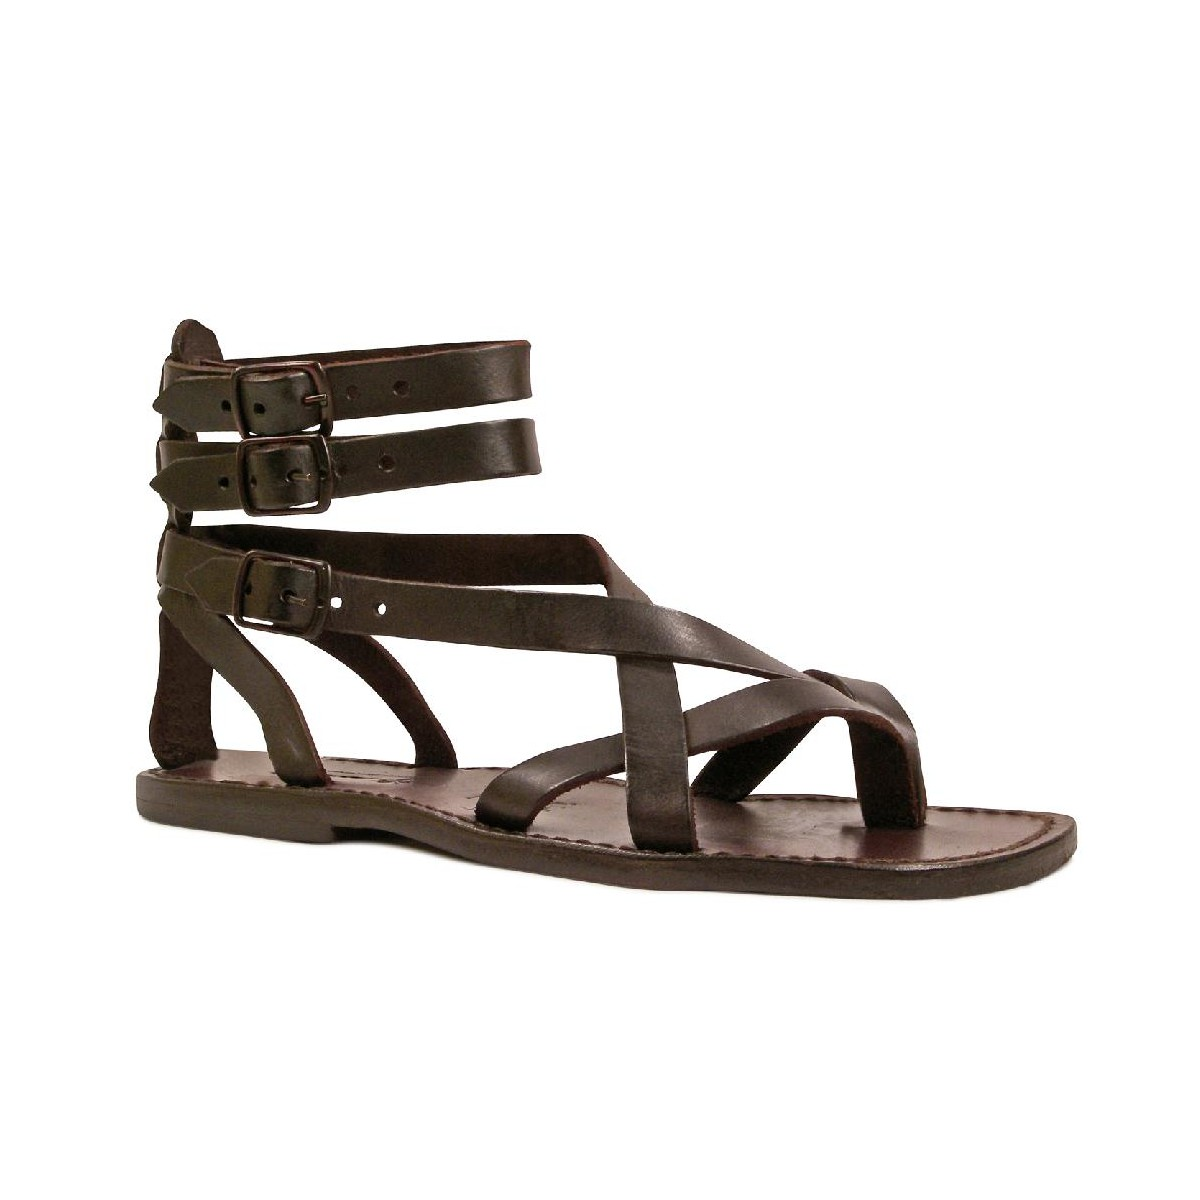 sandales gladiateur homme en cuir marron artisanales. Black Bedroom Furniture Sets. Home Design Ideas